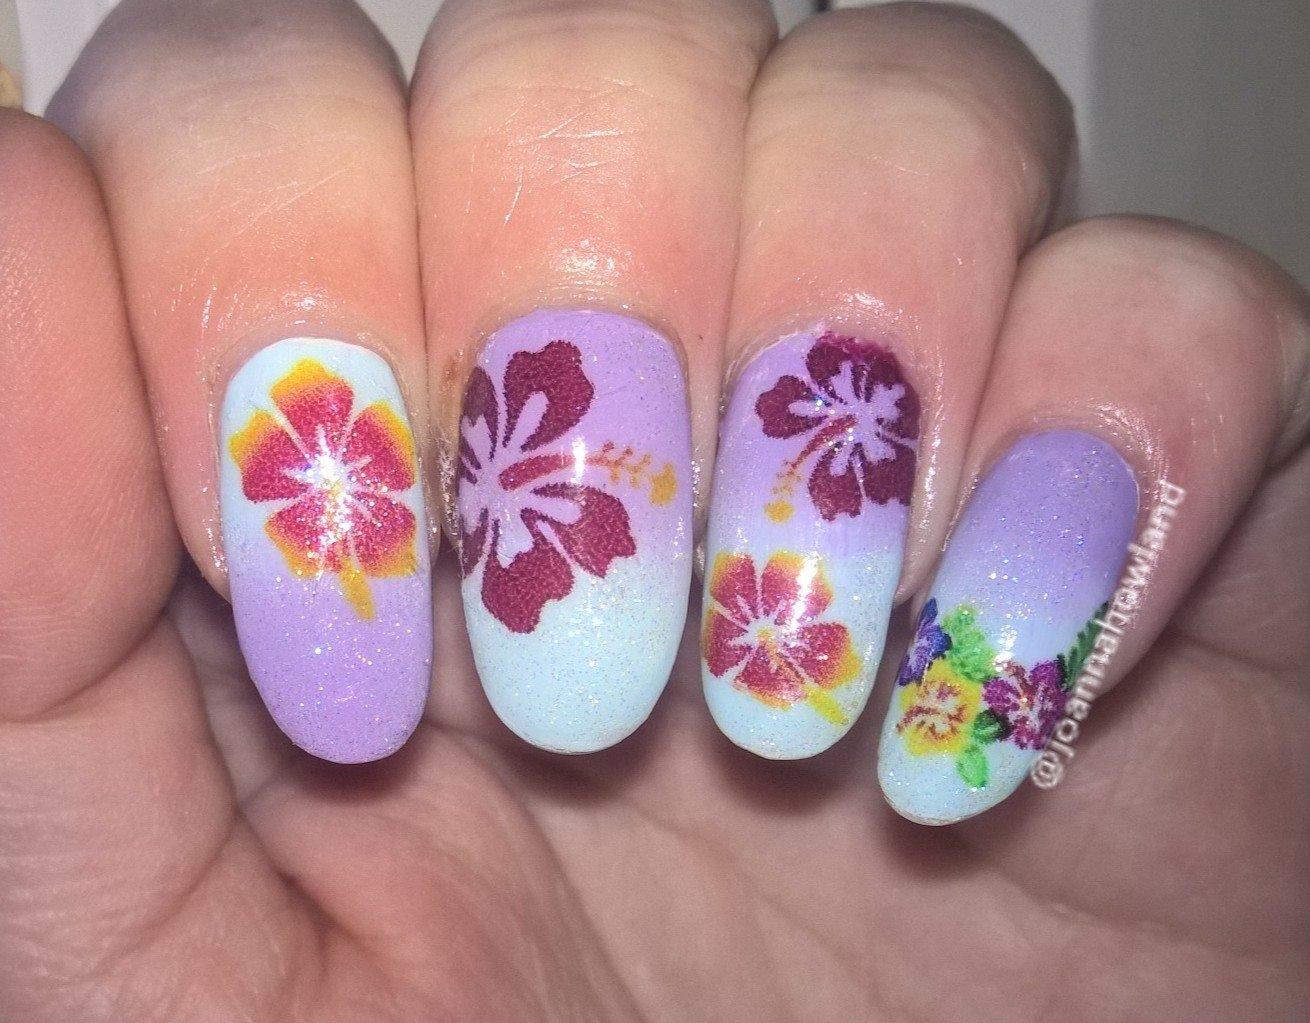 Amazon hibiscus flower collection hibiscus flower nail art amazon hibiscus flower collection hibiscus flower nail art decal jewelry izmirmasajfo